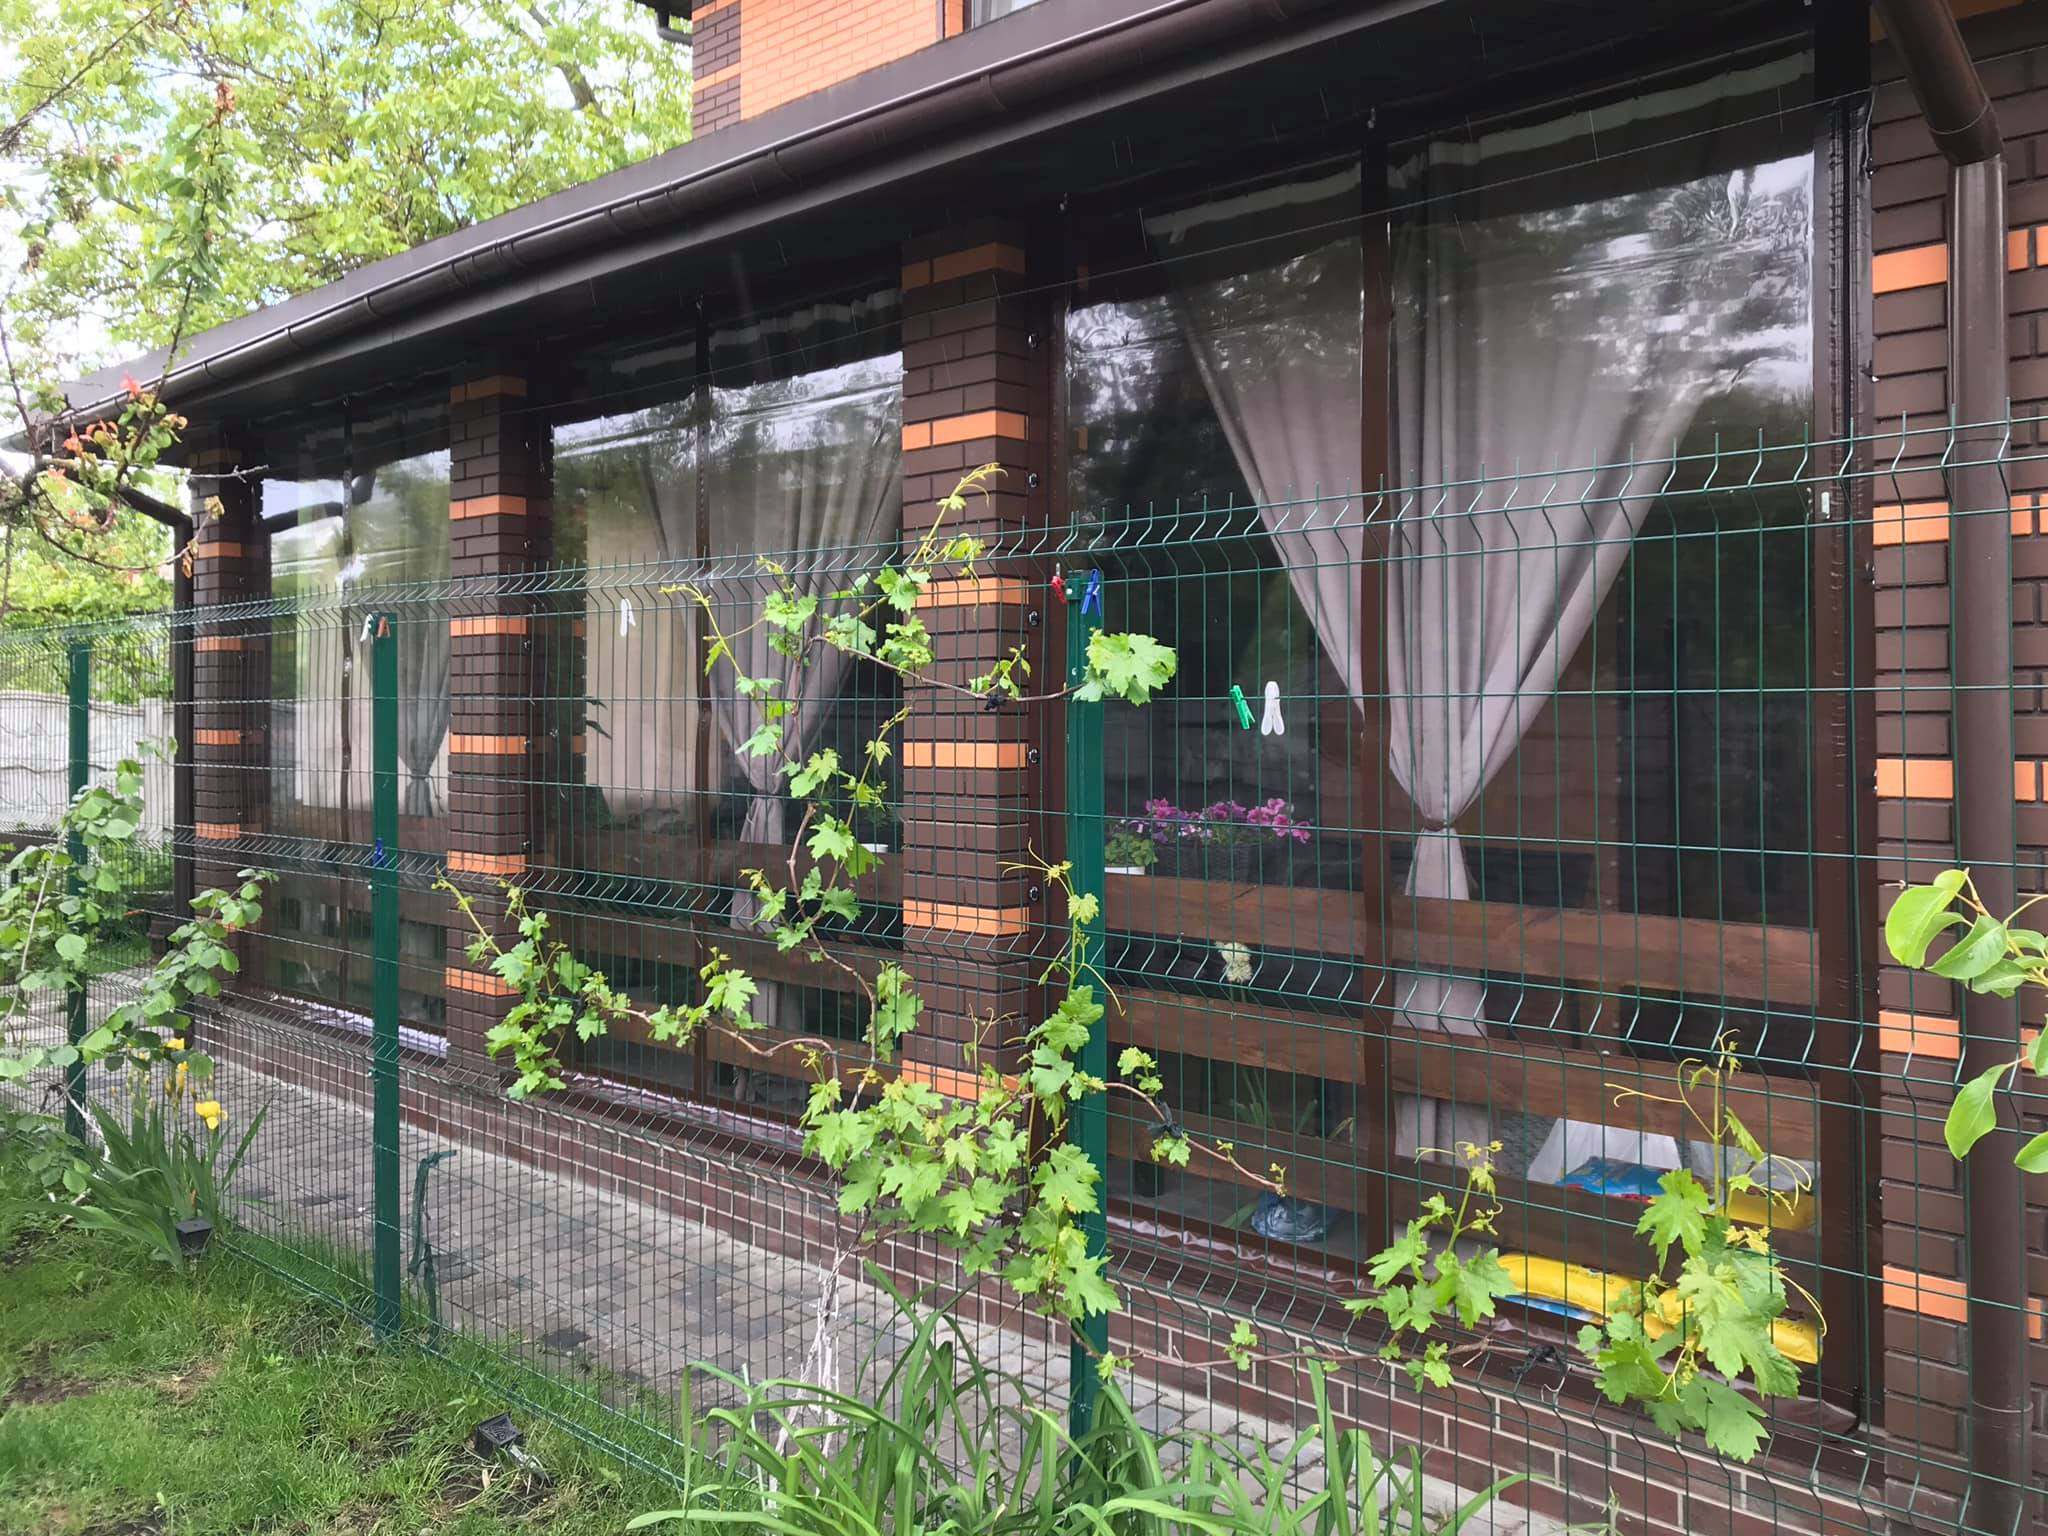 Мягкие окна на кирпичную веранду в Киеве (Славутич дачи)